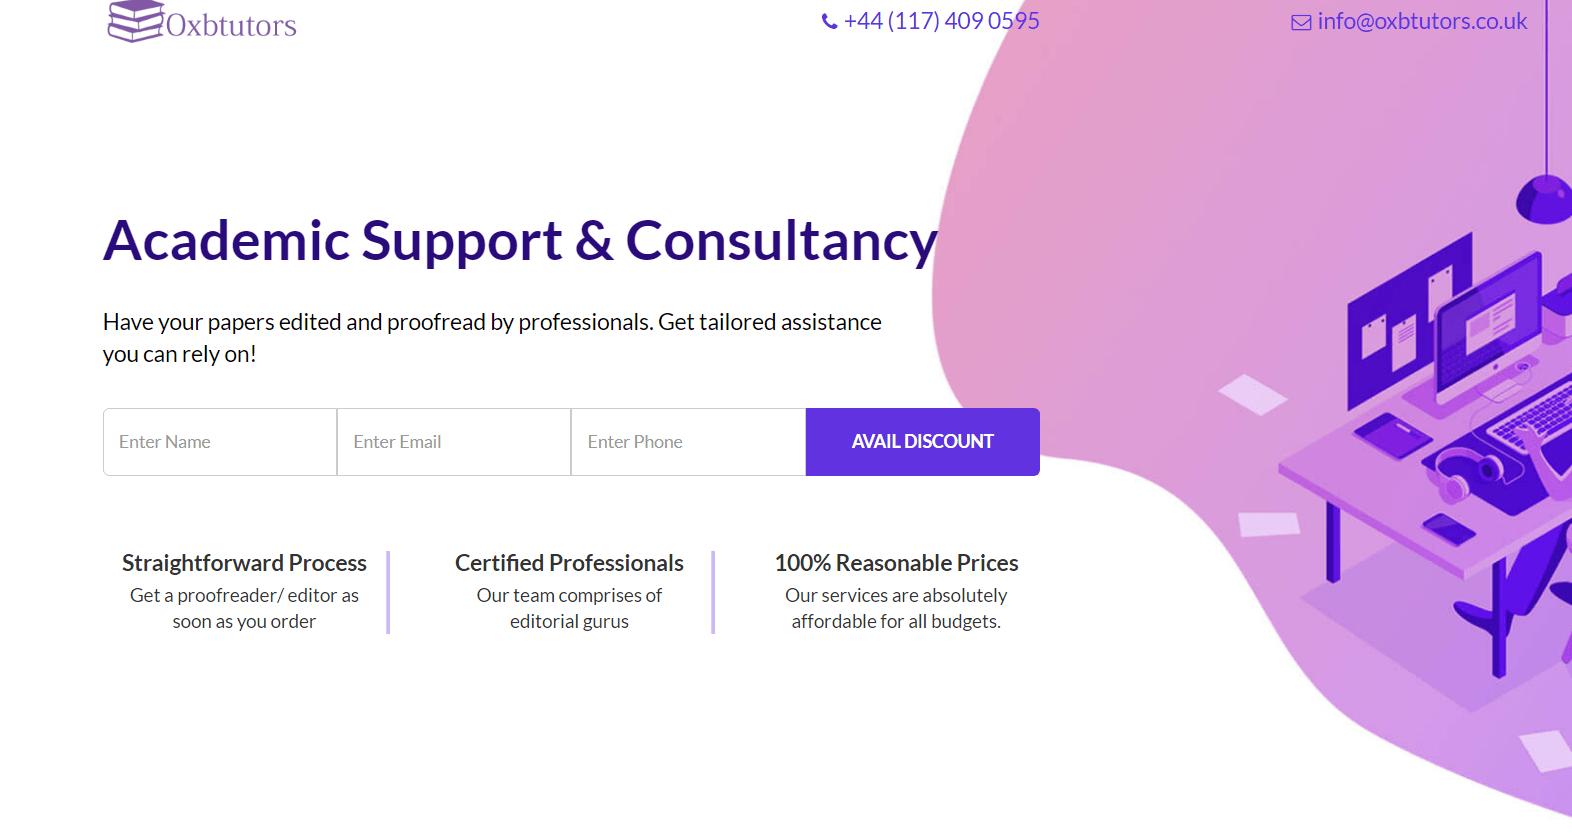 oxbtutors.co.uk